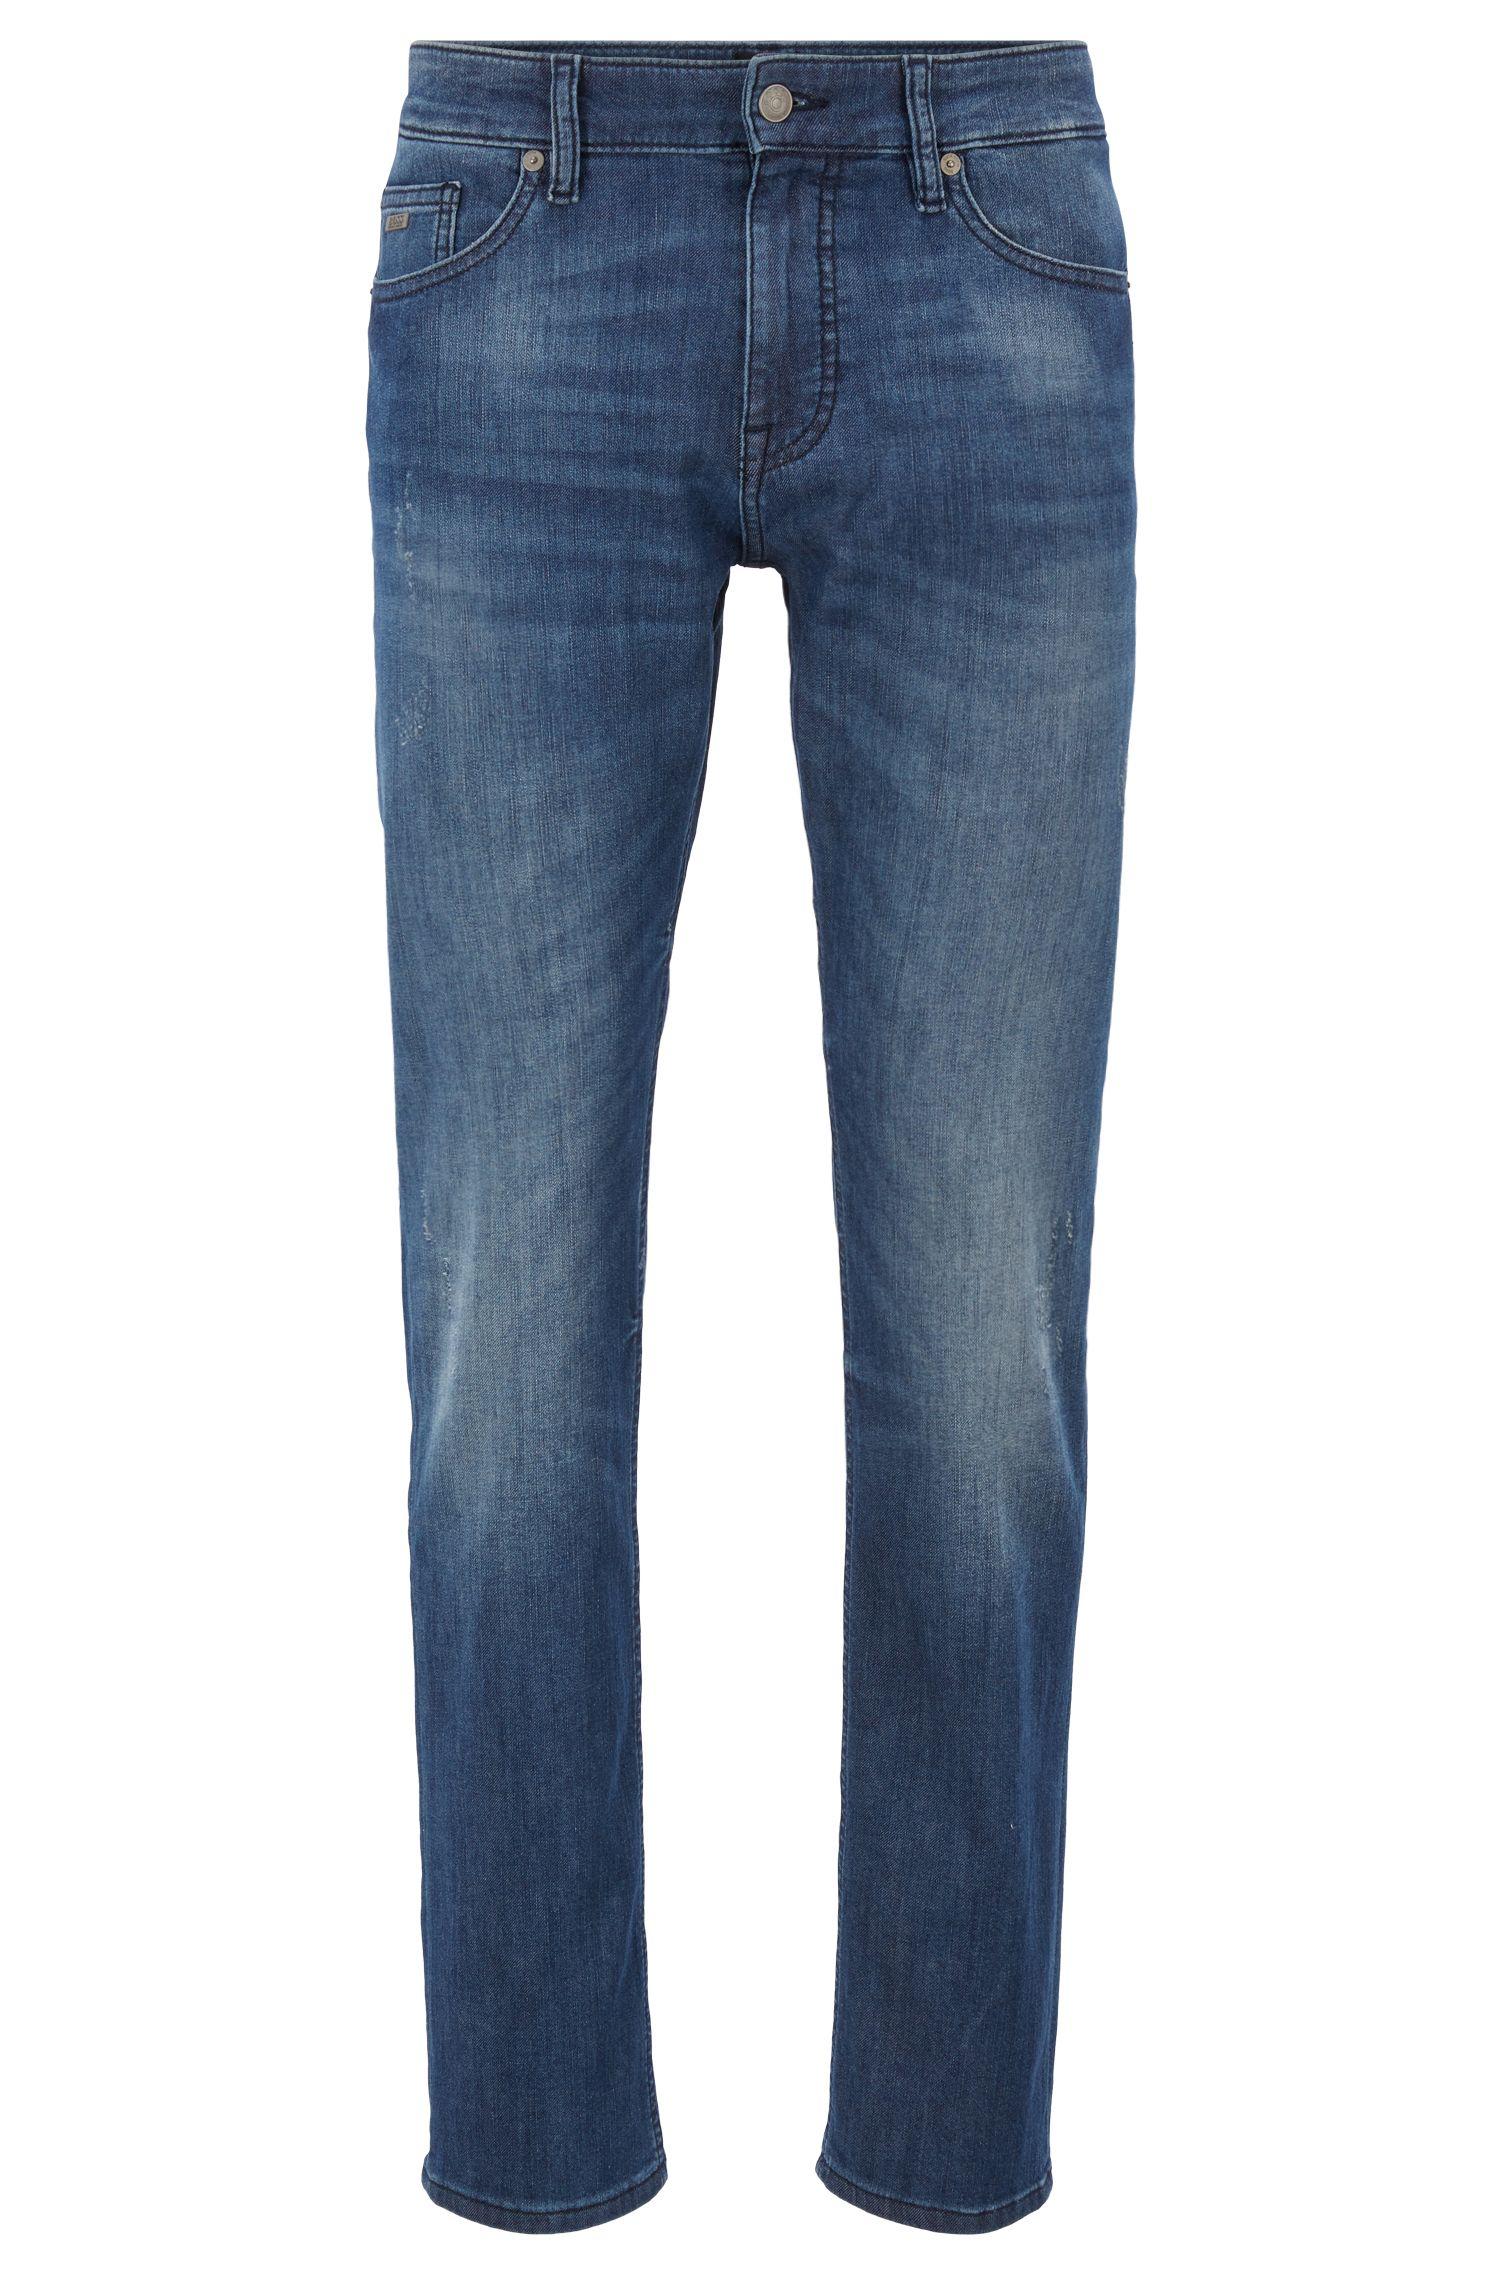 Slim-fit jeans in knitted stretch denim, Blue